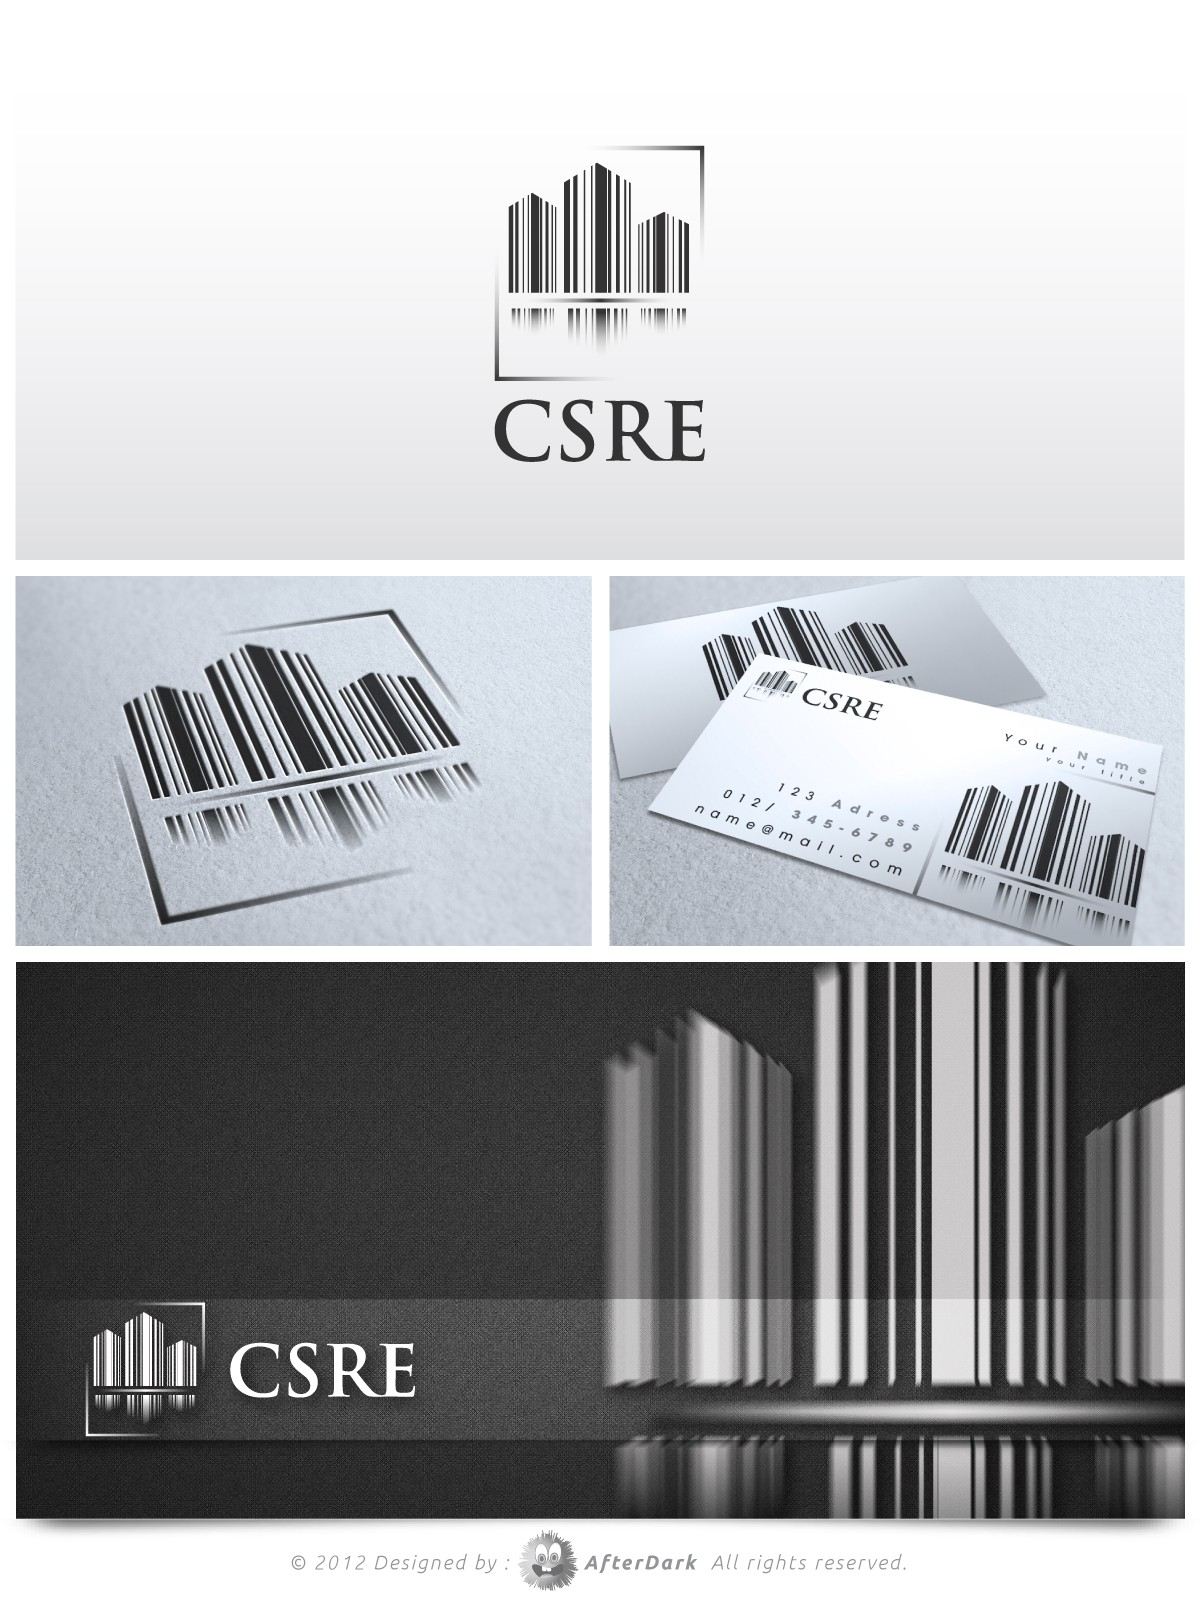 New York Real Estate company logo